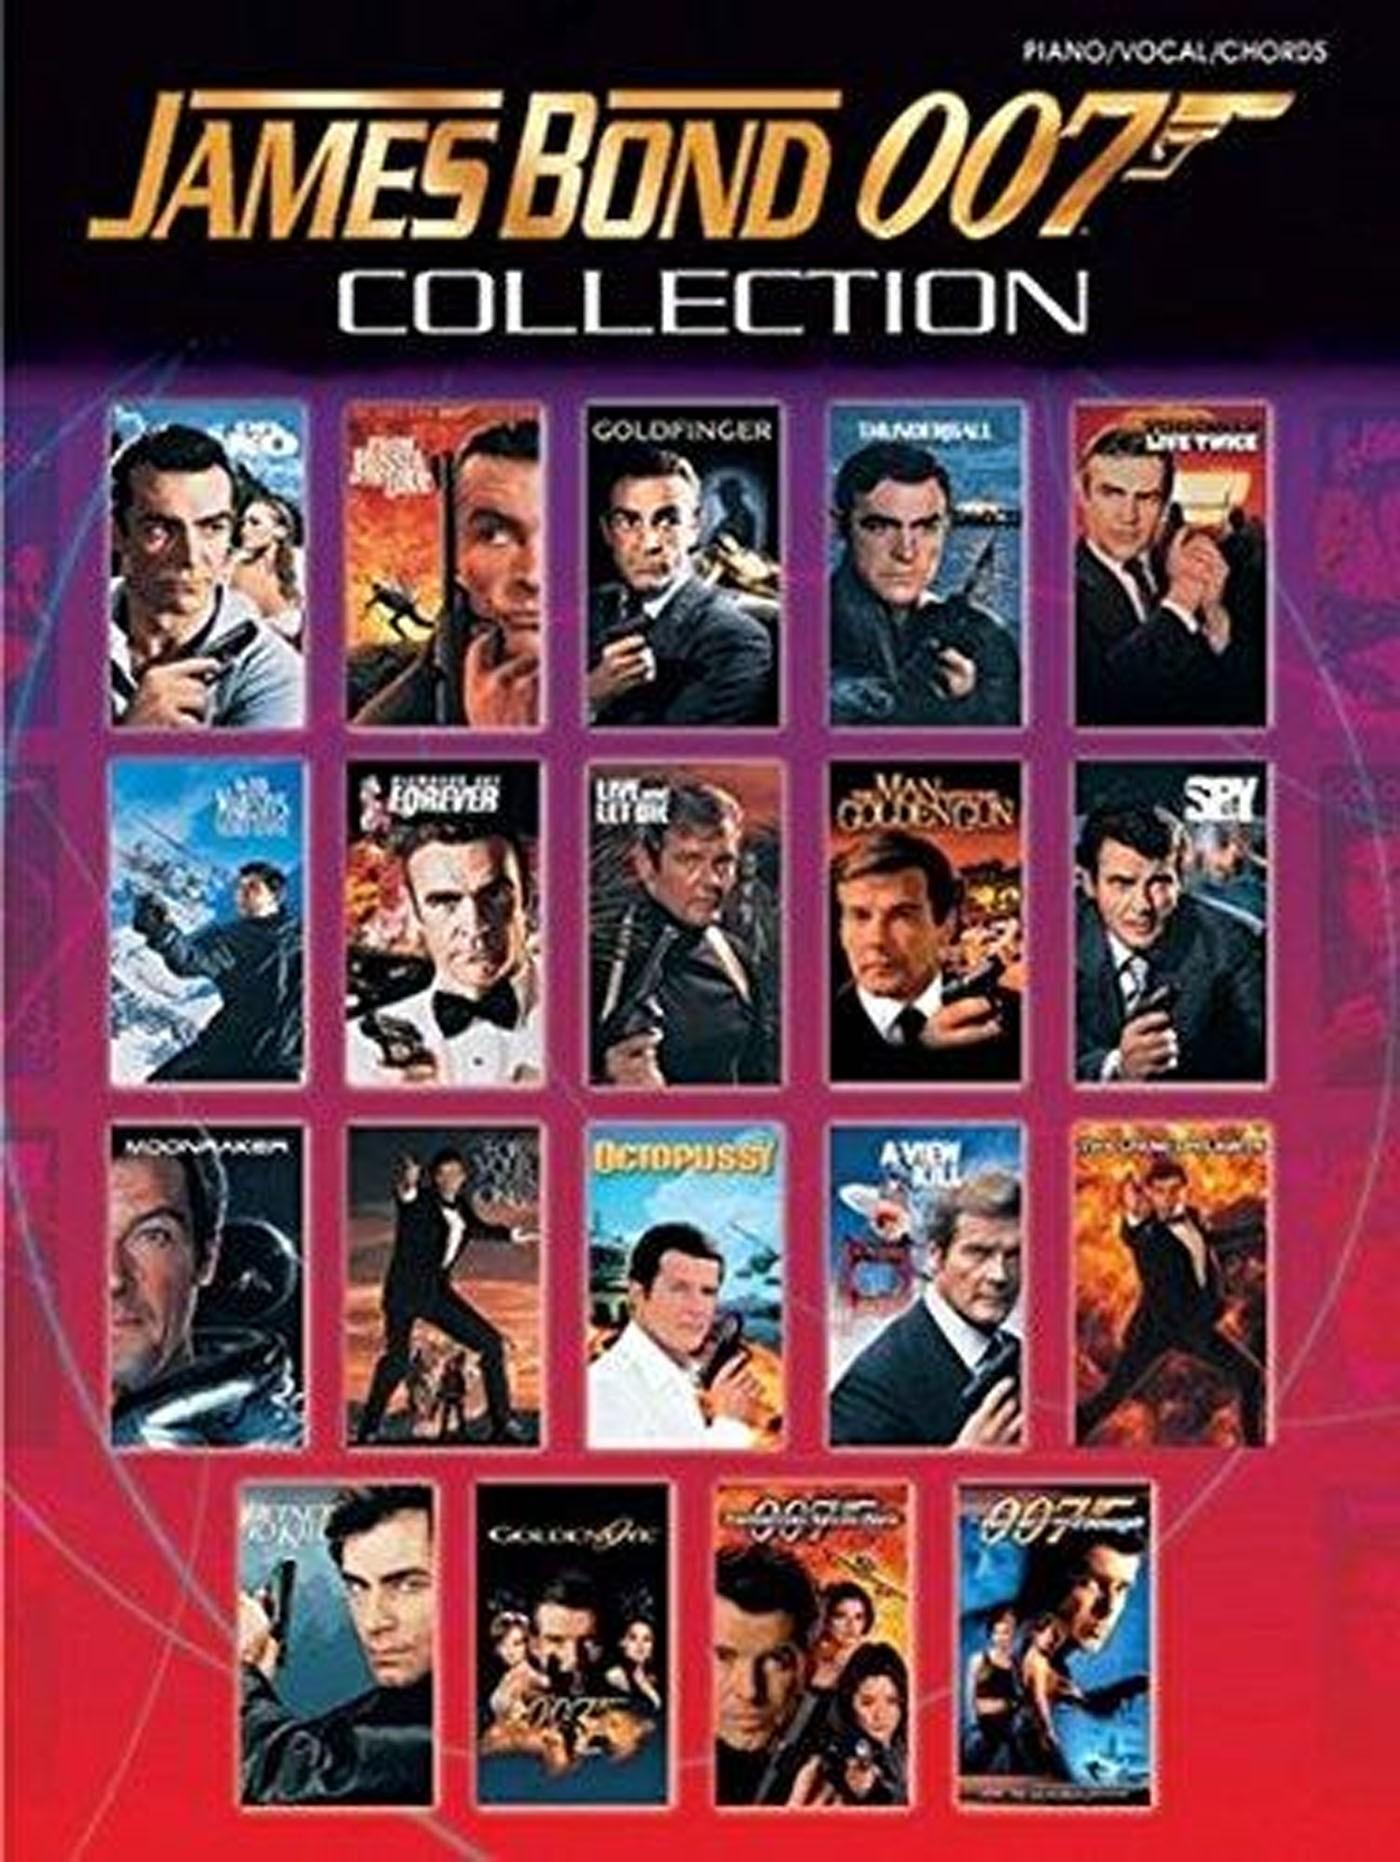 James Bond 007 Collection Piano Vocal Chords Book Film Spy Soundtracks S166